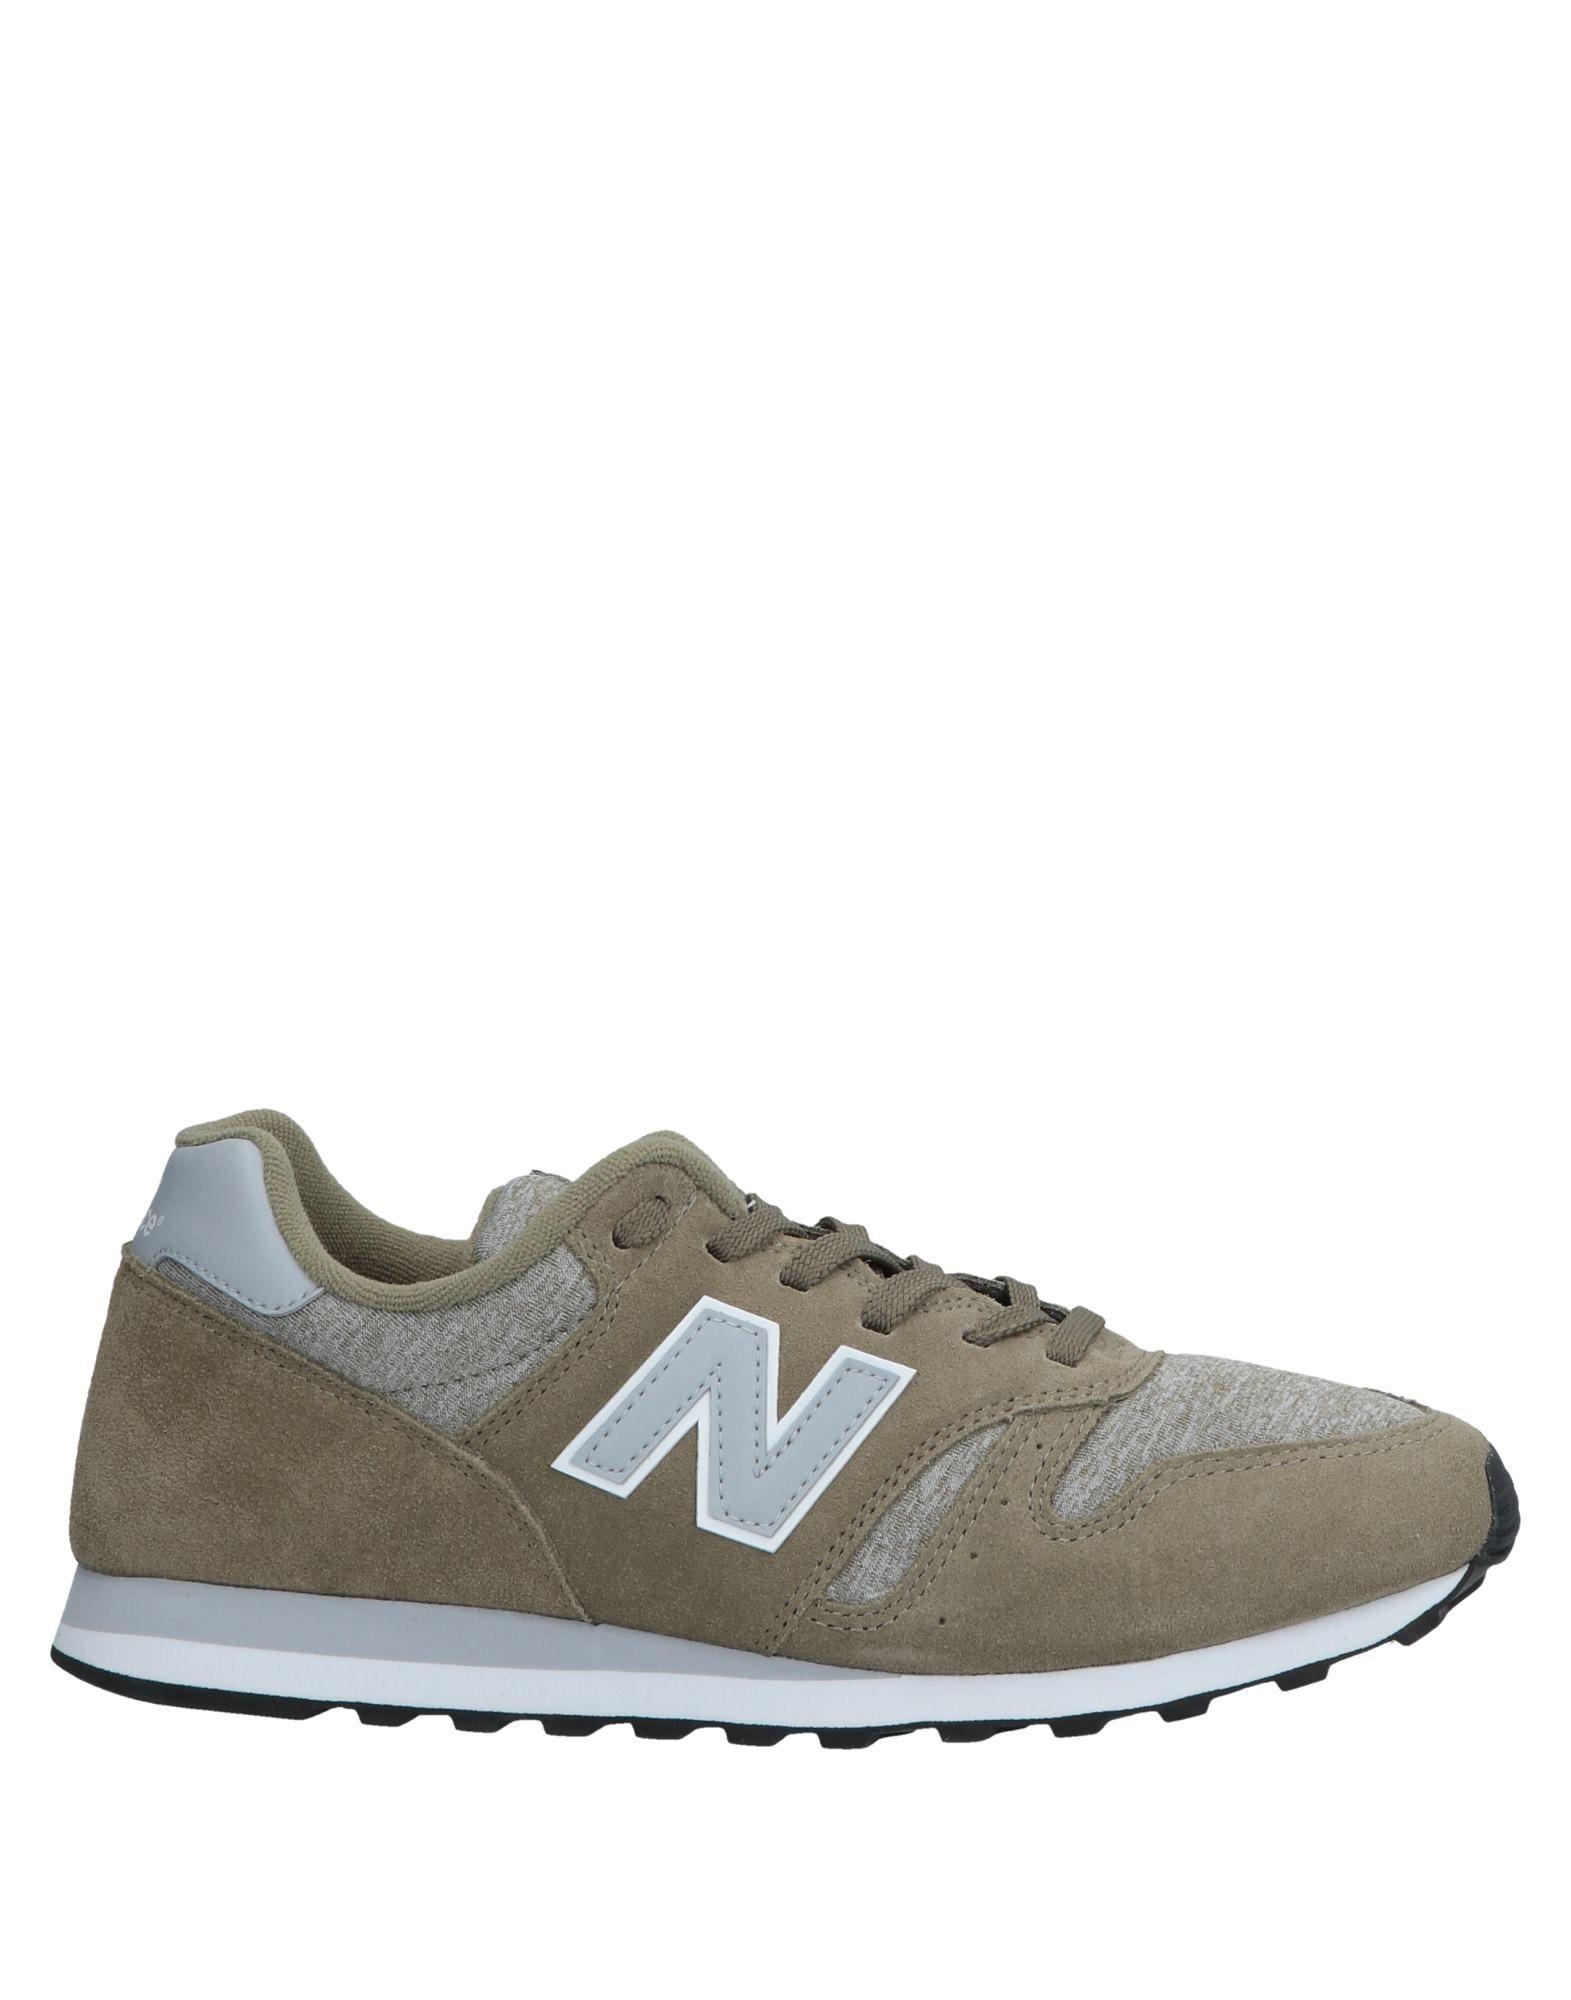 Rabatt echte Herren Schuhe New Balance Sneakers Herren echte  11570381XM b6da74